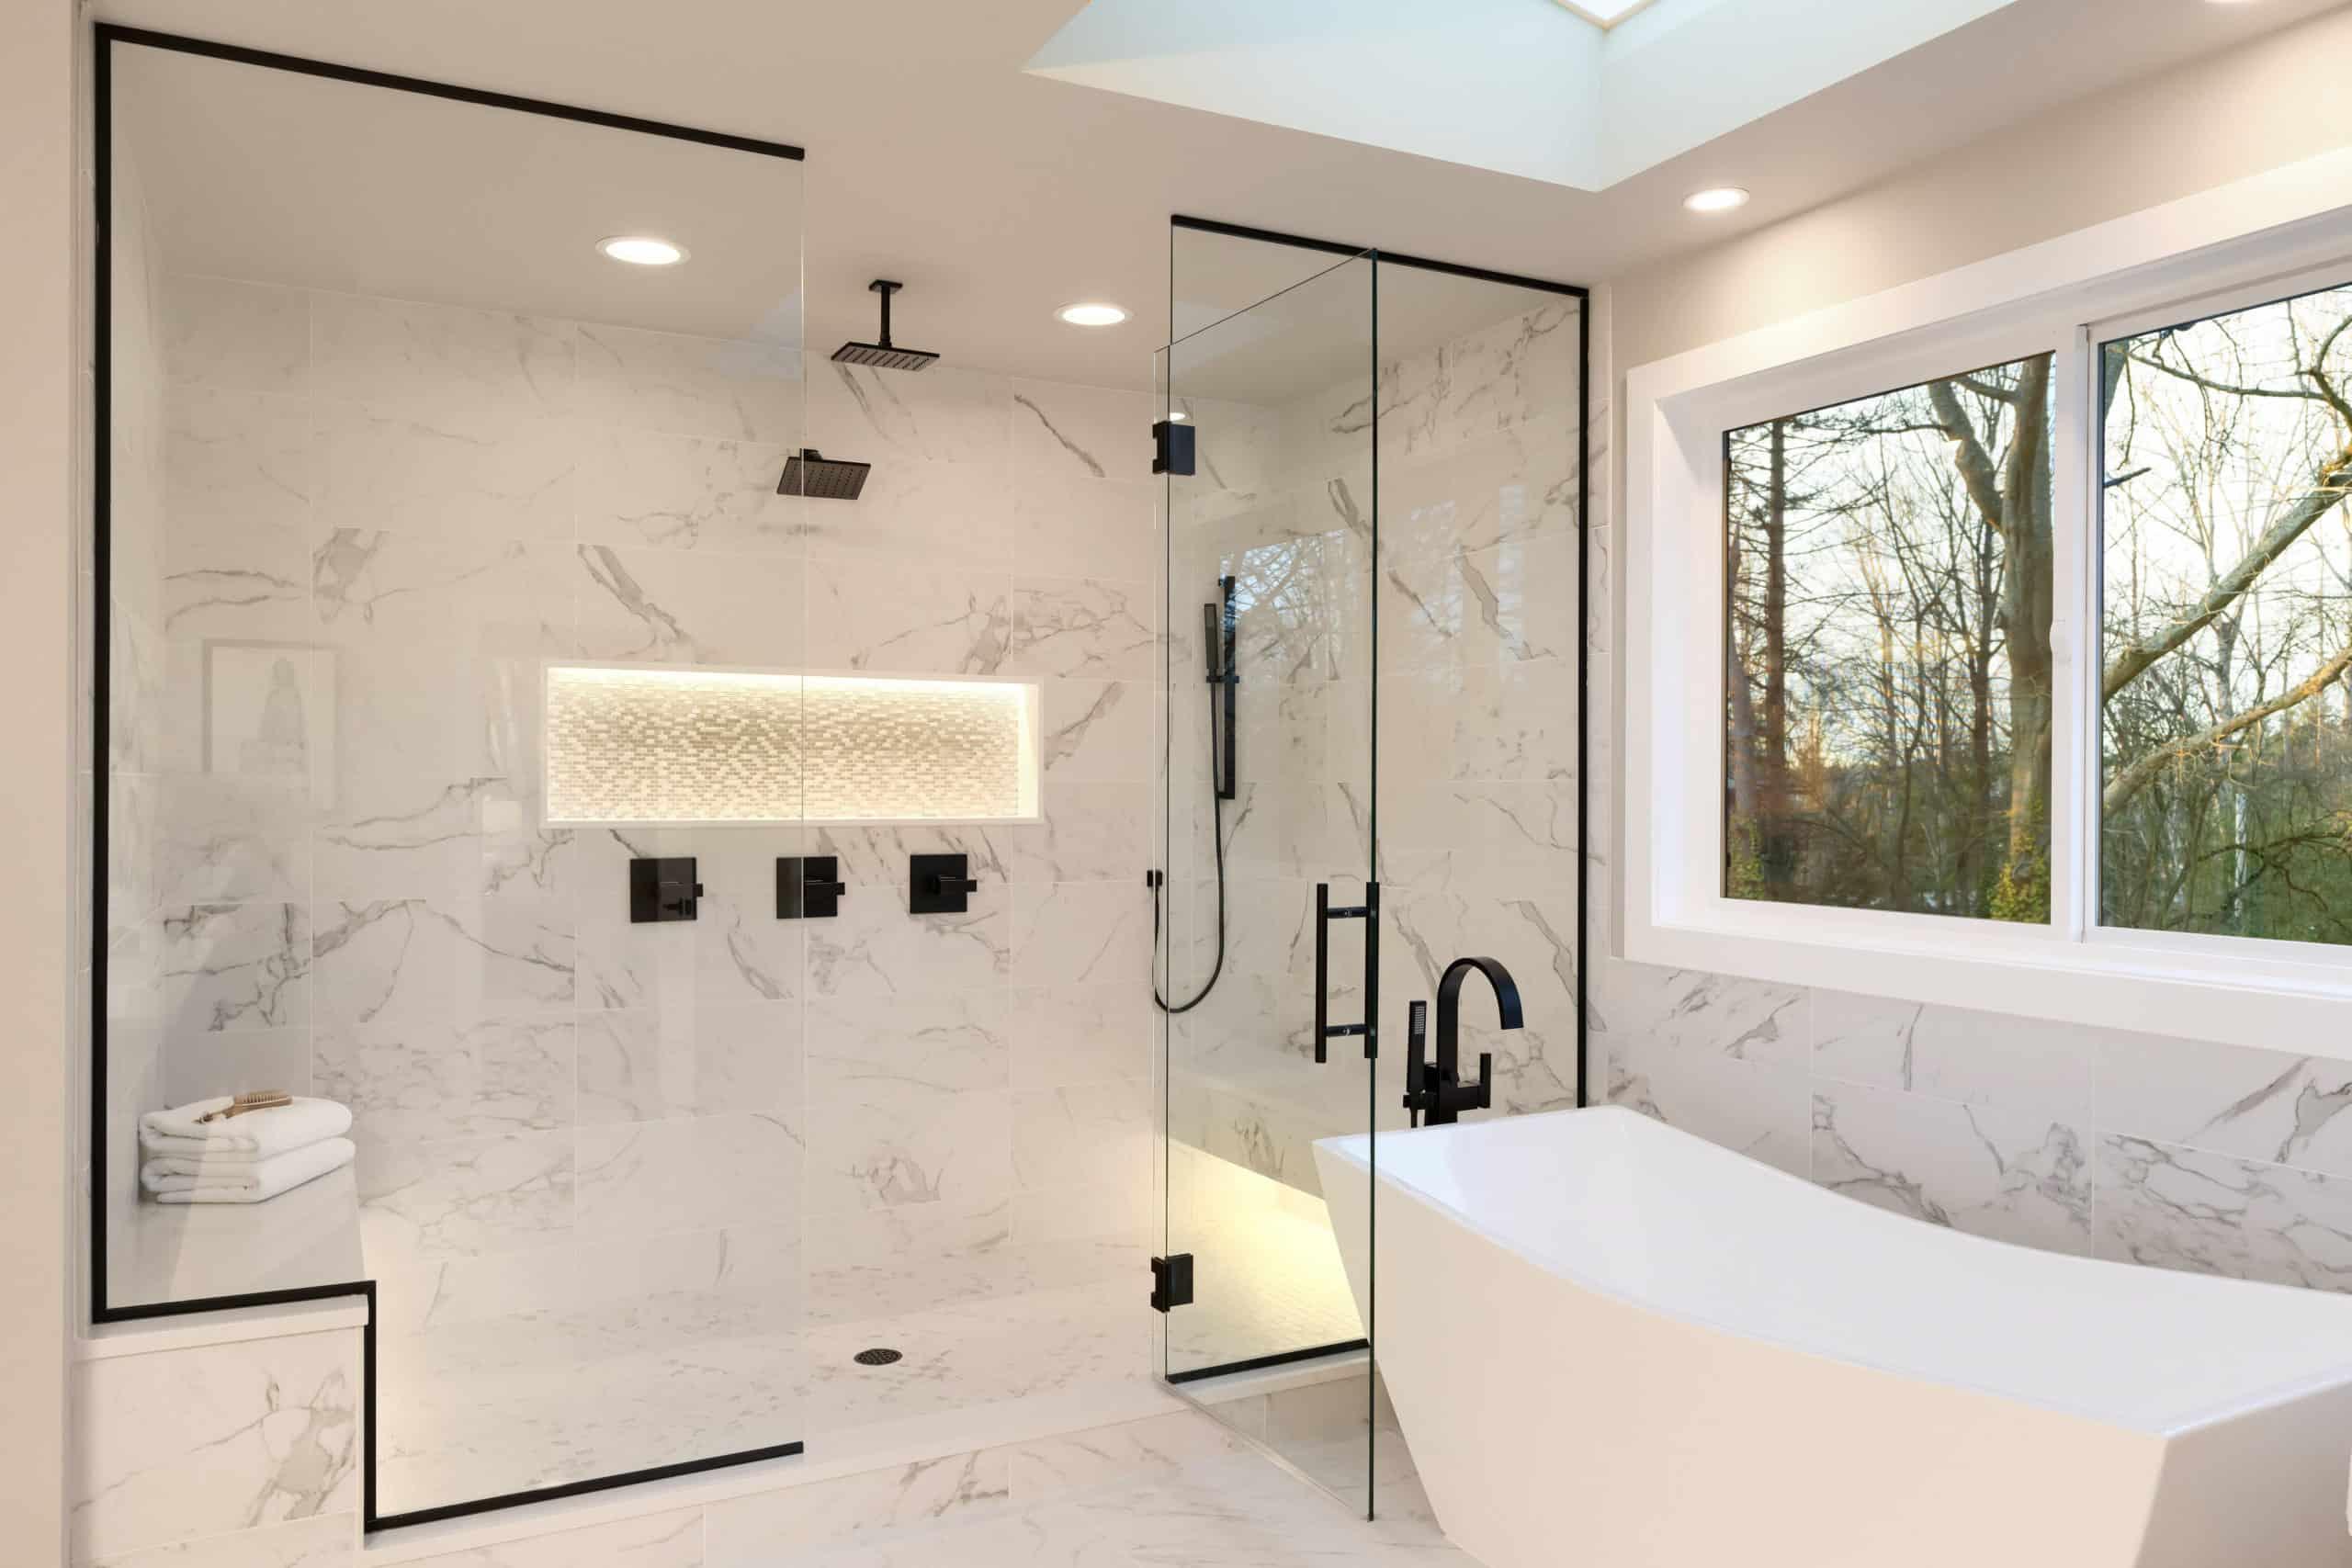 Anti Slip Treatment in hotel shower